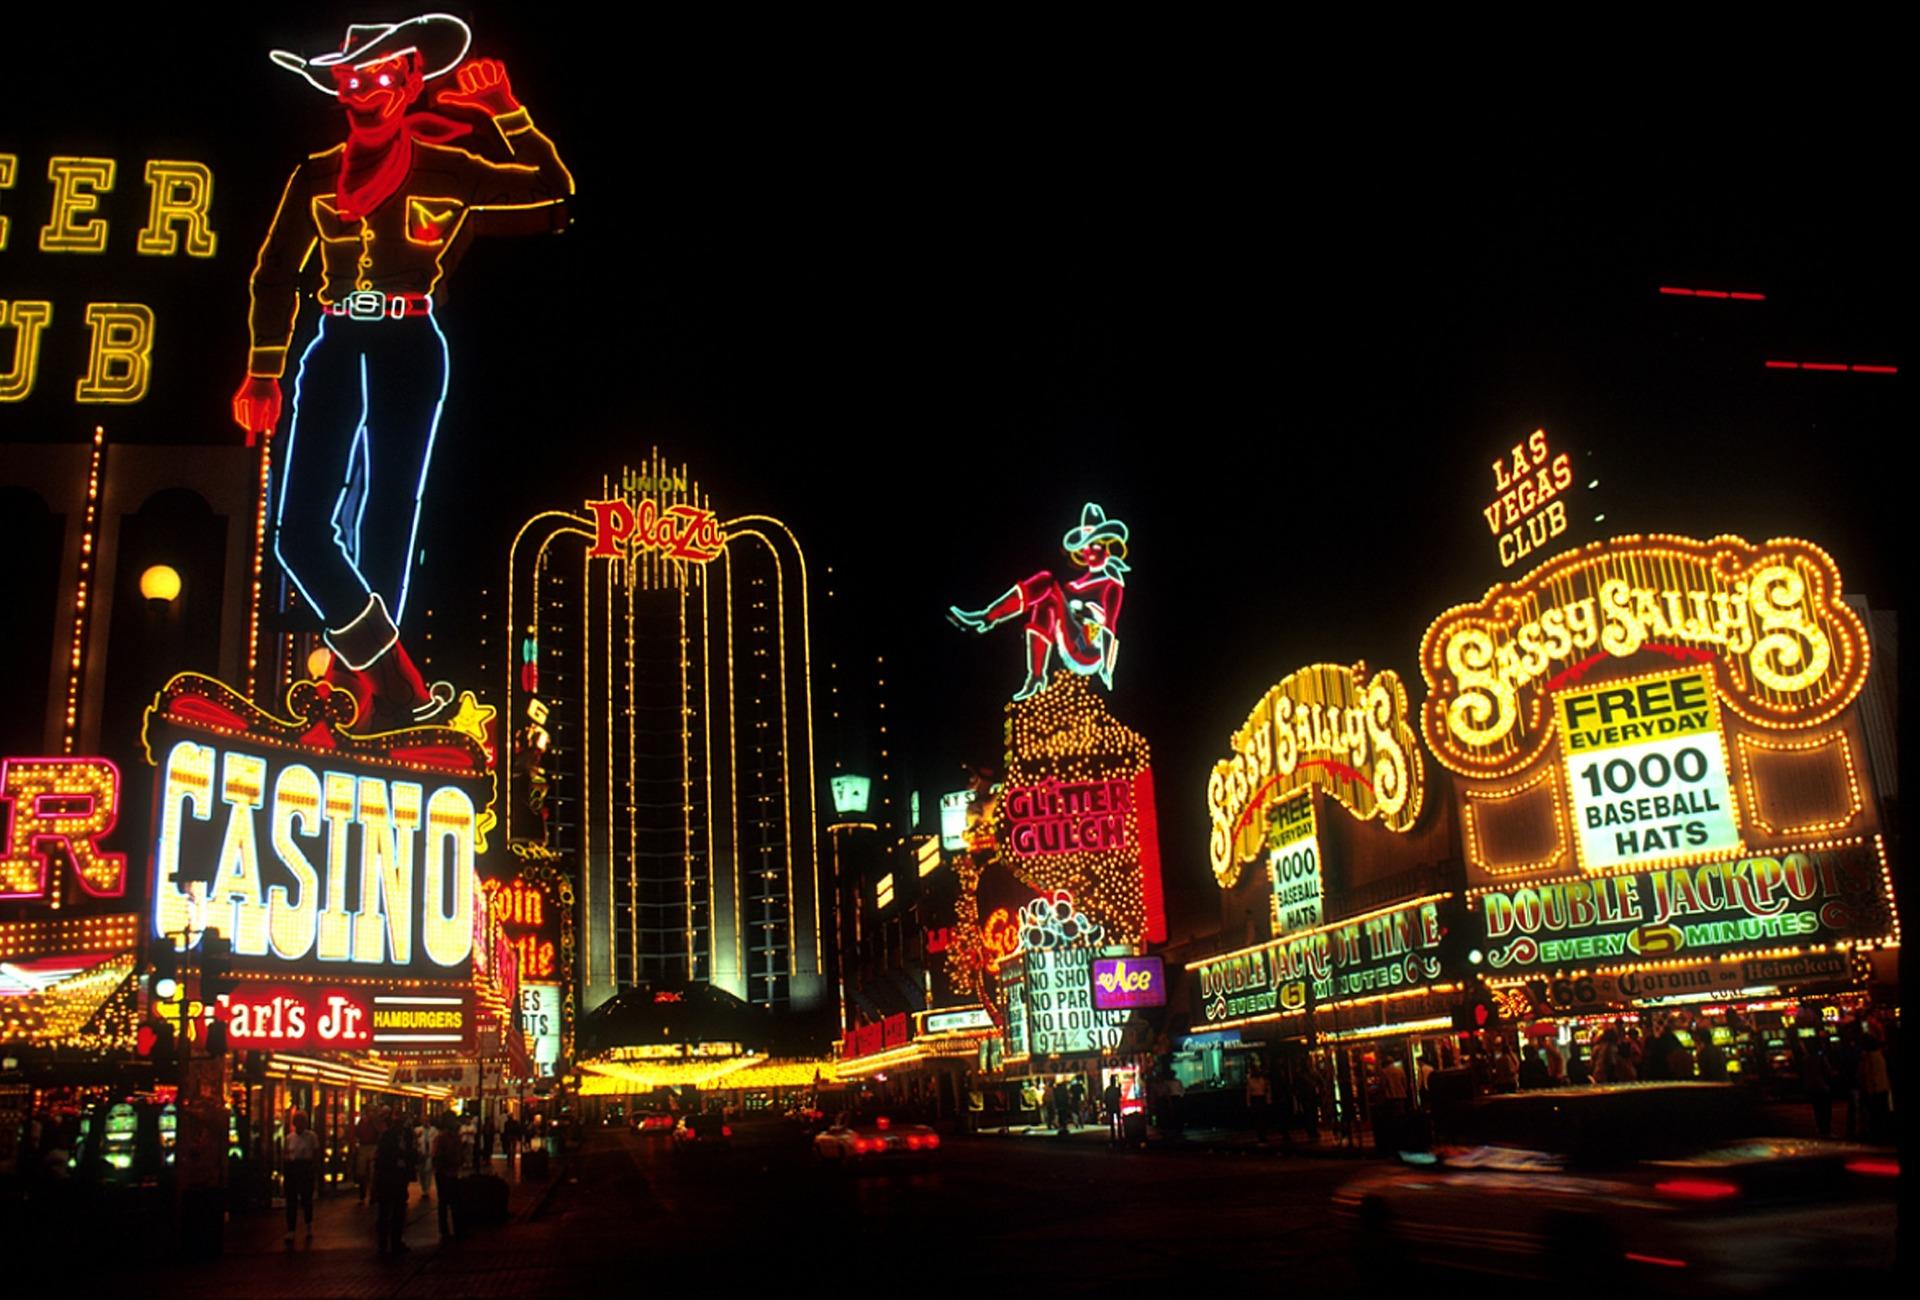 Neon Lights in Las Vegas at night